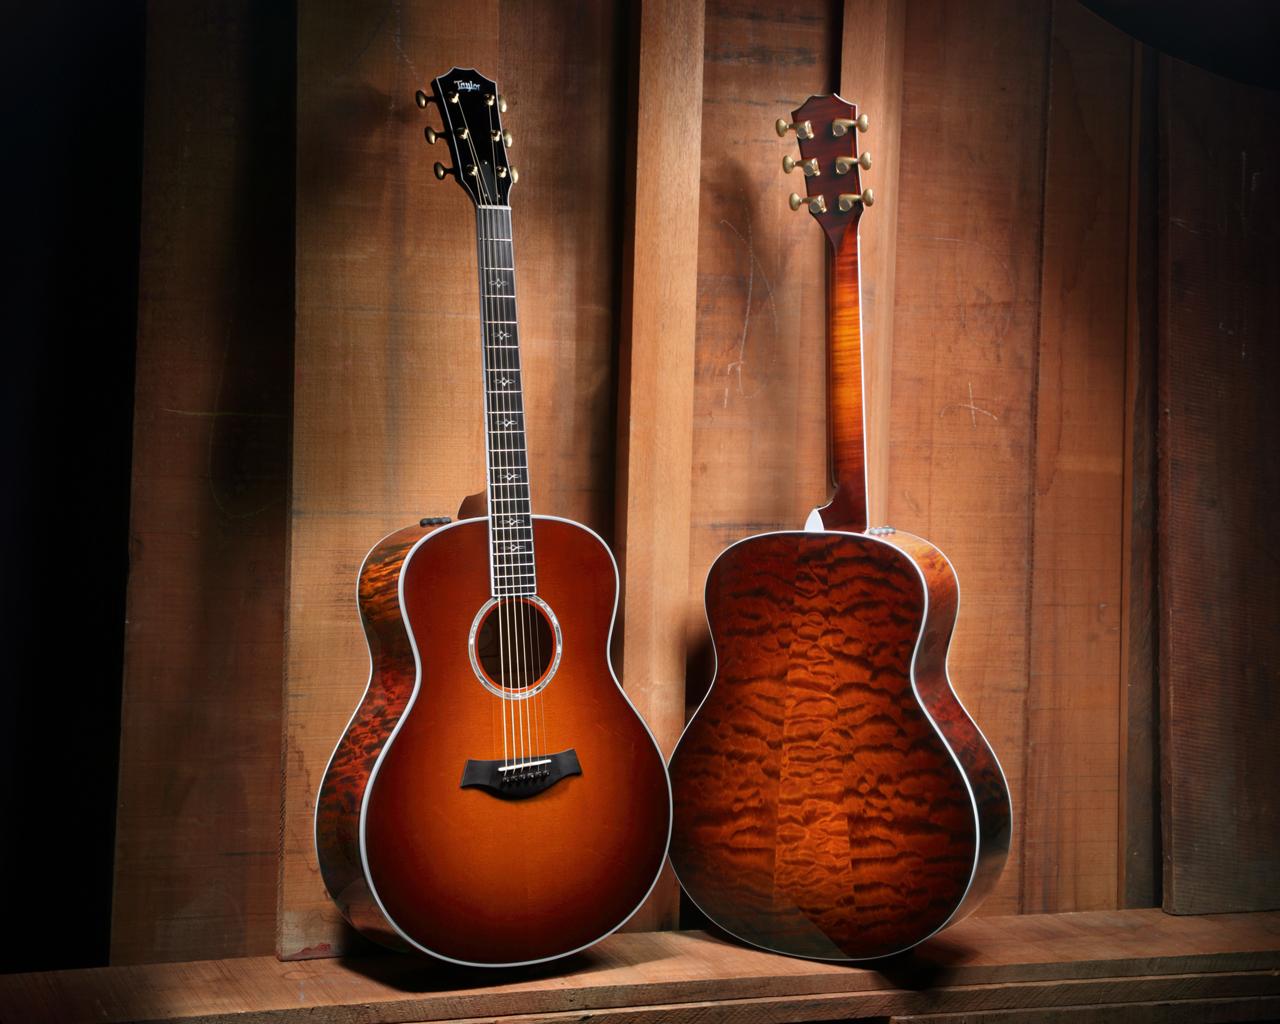 taylor guitars wallpapers - photo #4